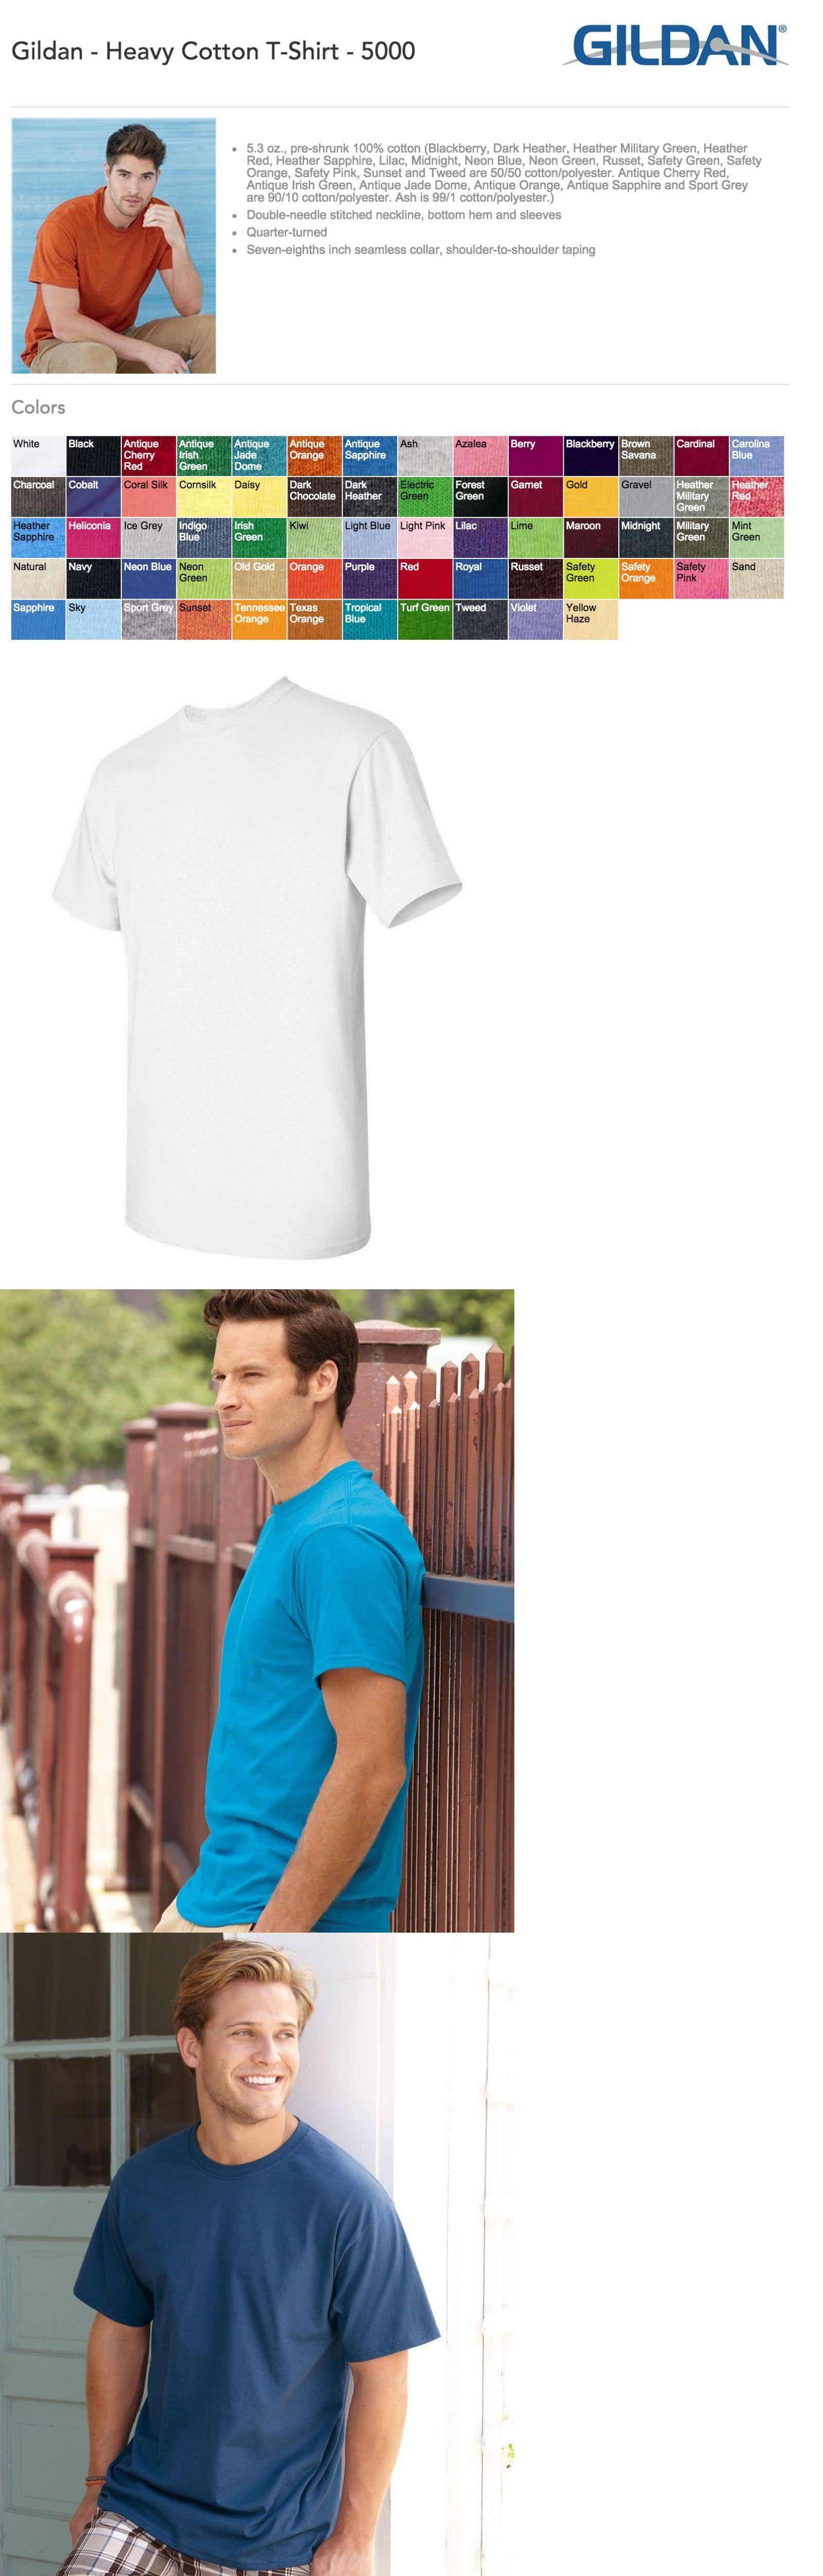 T-SHIRTS BLANK BULK LOT Colors or White S-XL Wholesale Goods 40